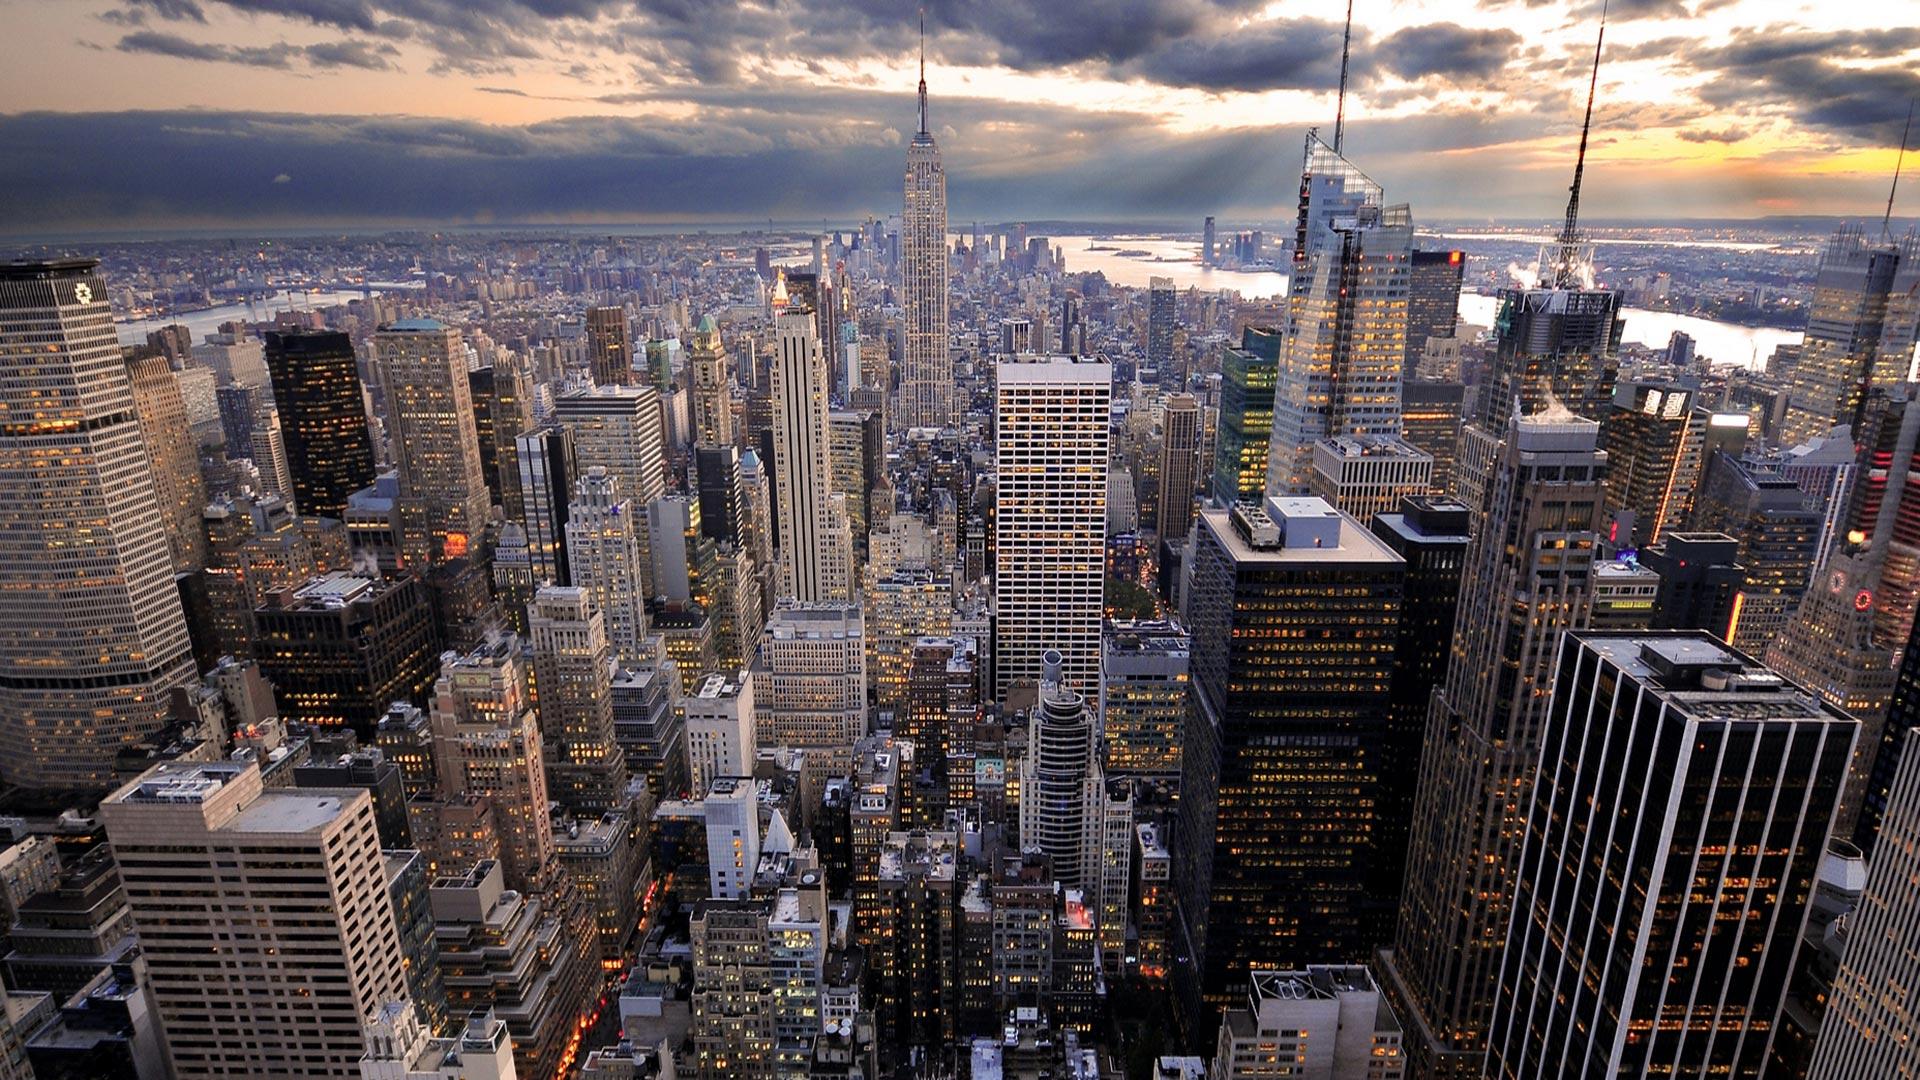 Wallpapers New York City Landscape wallpaper 1920x1080